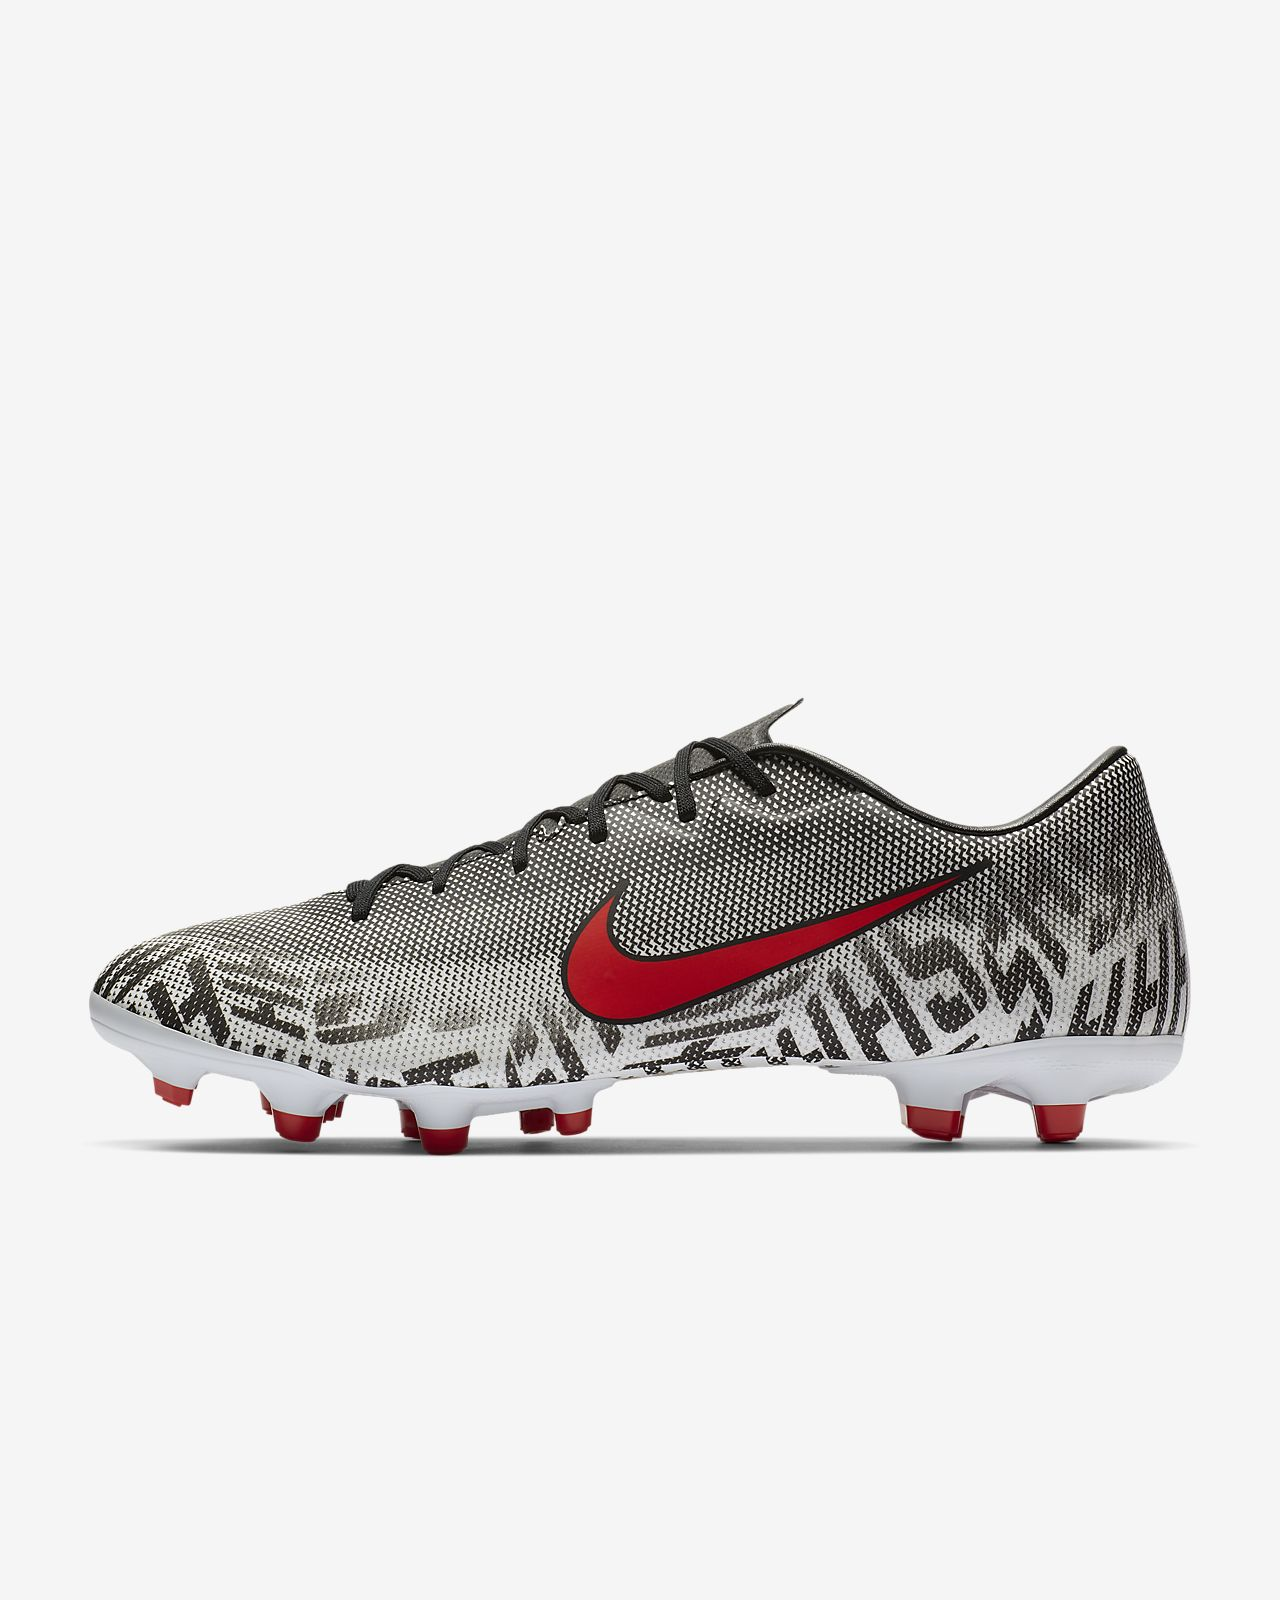 Calzado de fútbol para múltiples superficies Nike Mercurial Vapor XII Academy Neymar